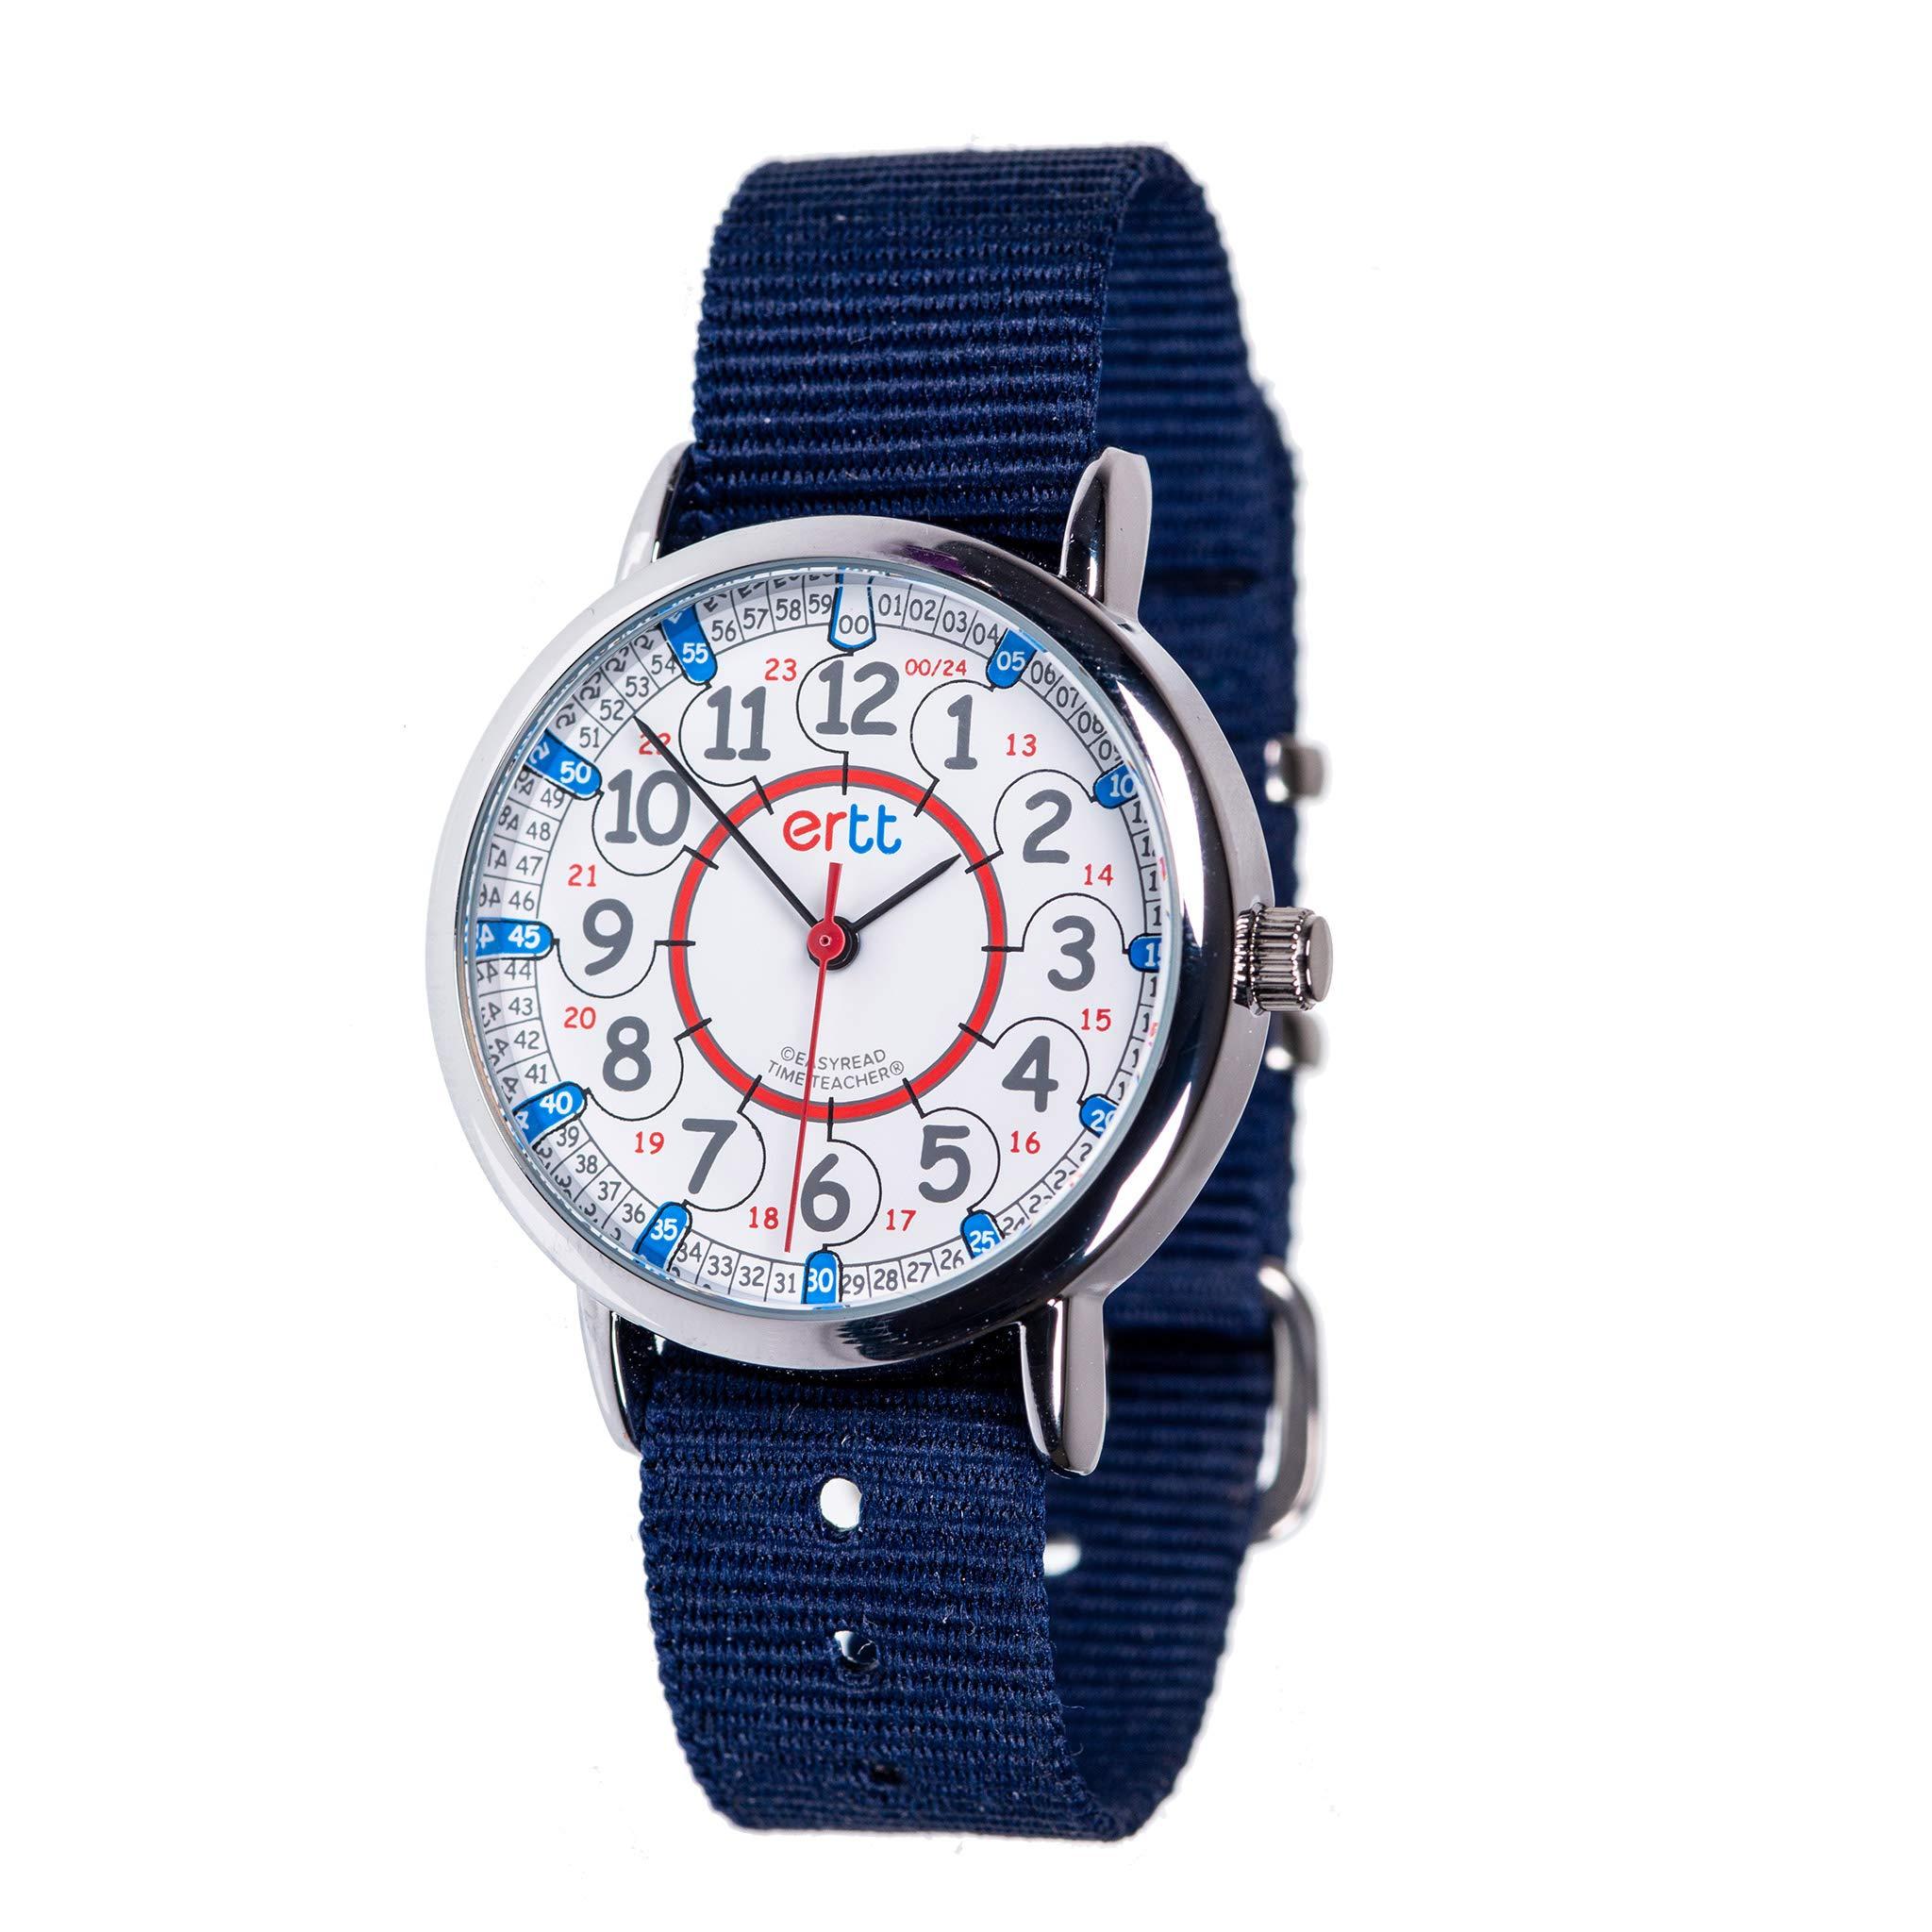 EasyRead Time Teacher Children's Watch, Red Blue 12/24 Hour Face, Navy Blue Strap by EasyRead Time Teacher